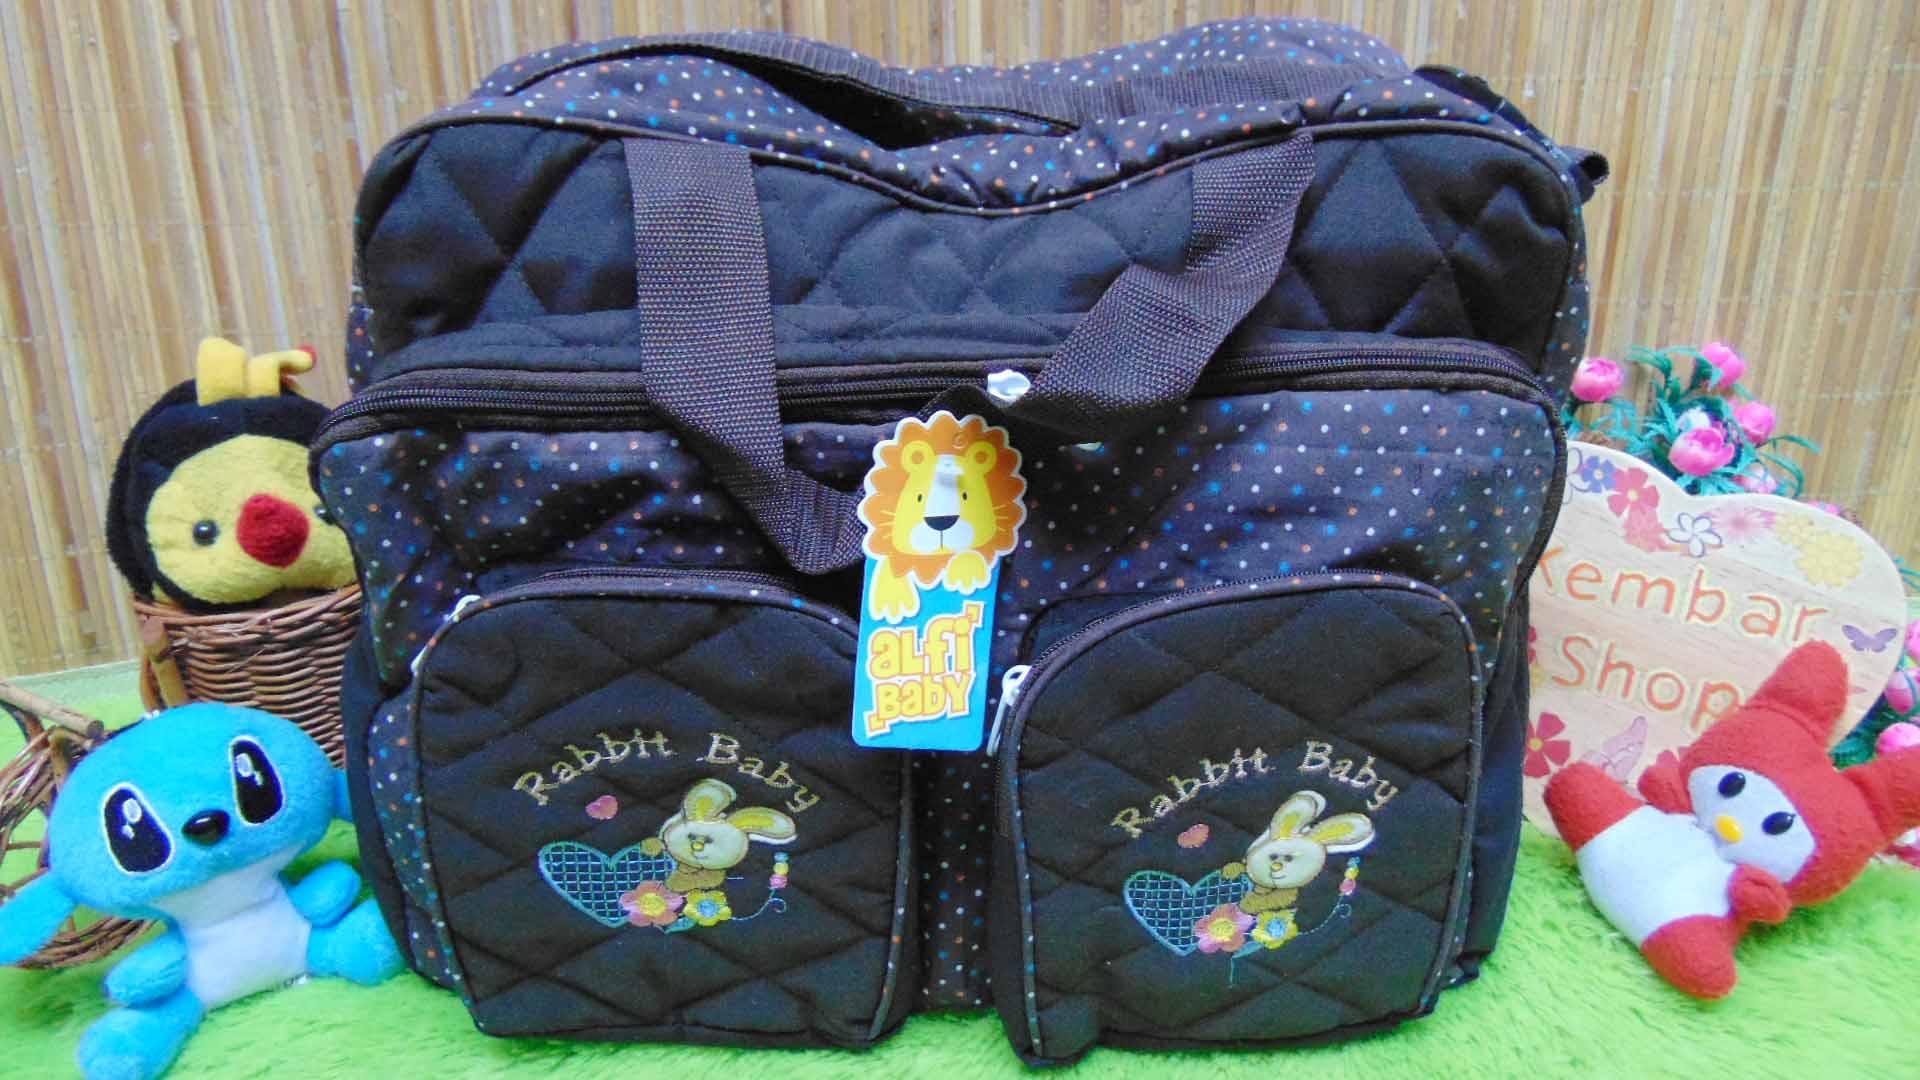 kado lahiran bayi baby gift tas perlengkapan bayi jumbo polka besar cokelat